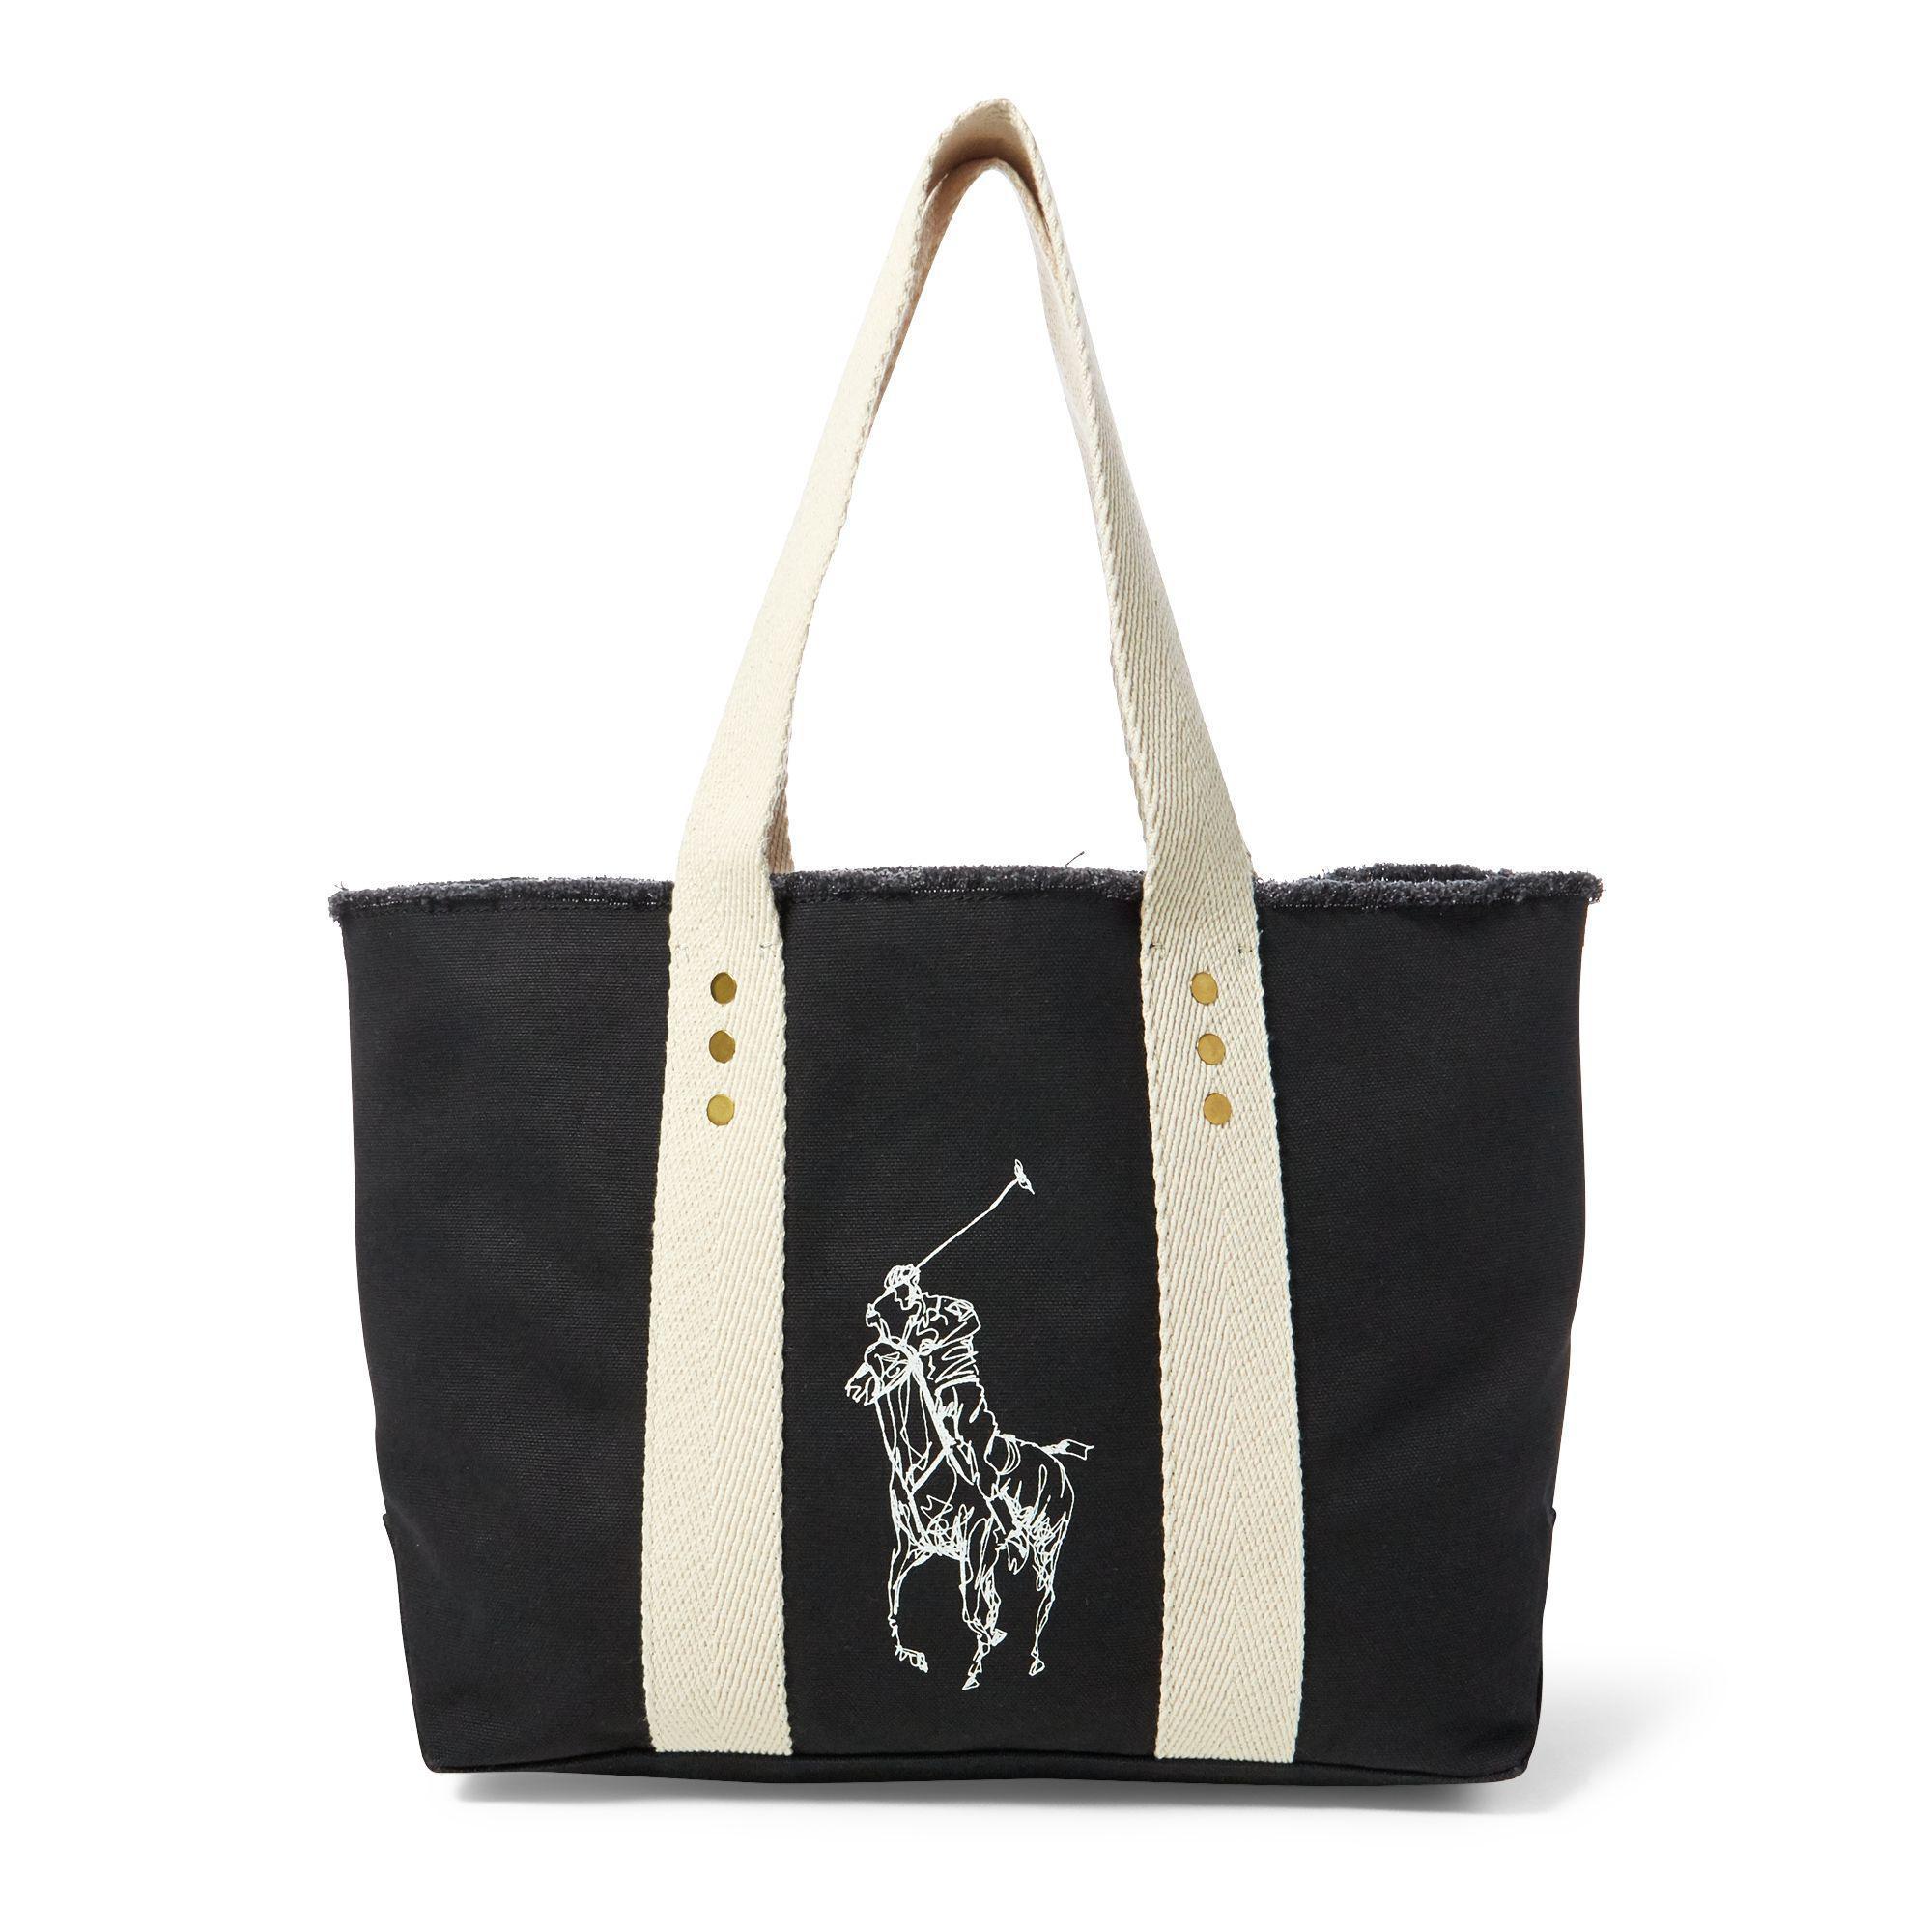 ... czech polo ralph lauren canvas big pony medium tote in black lyst d8694  d3514 73ce46b804a35